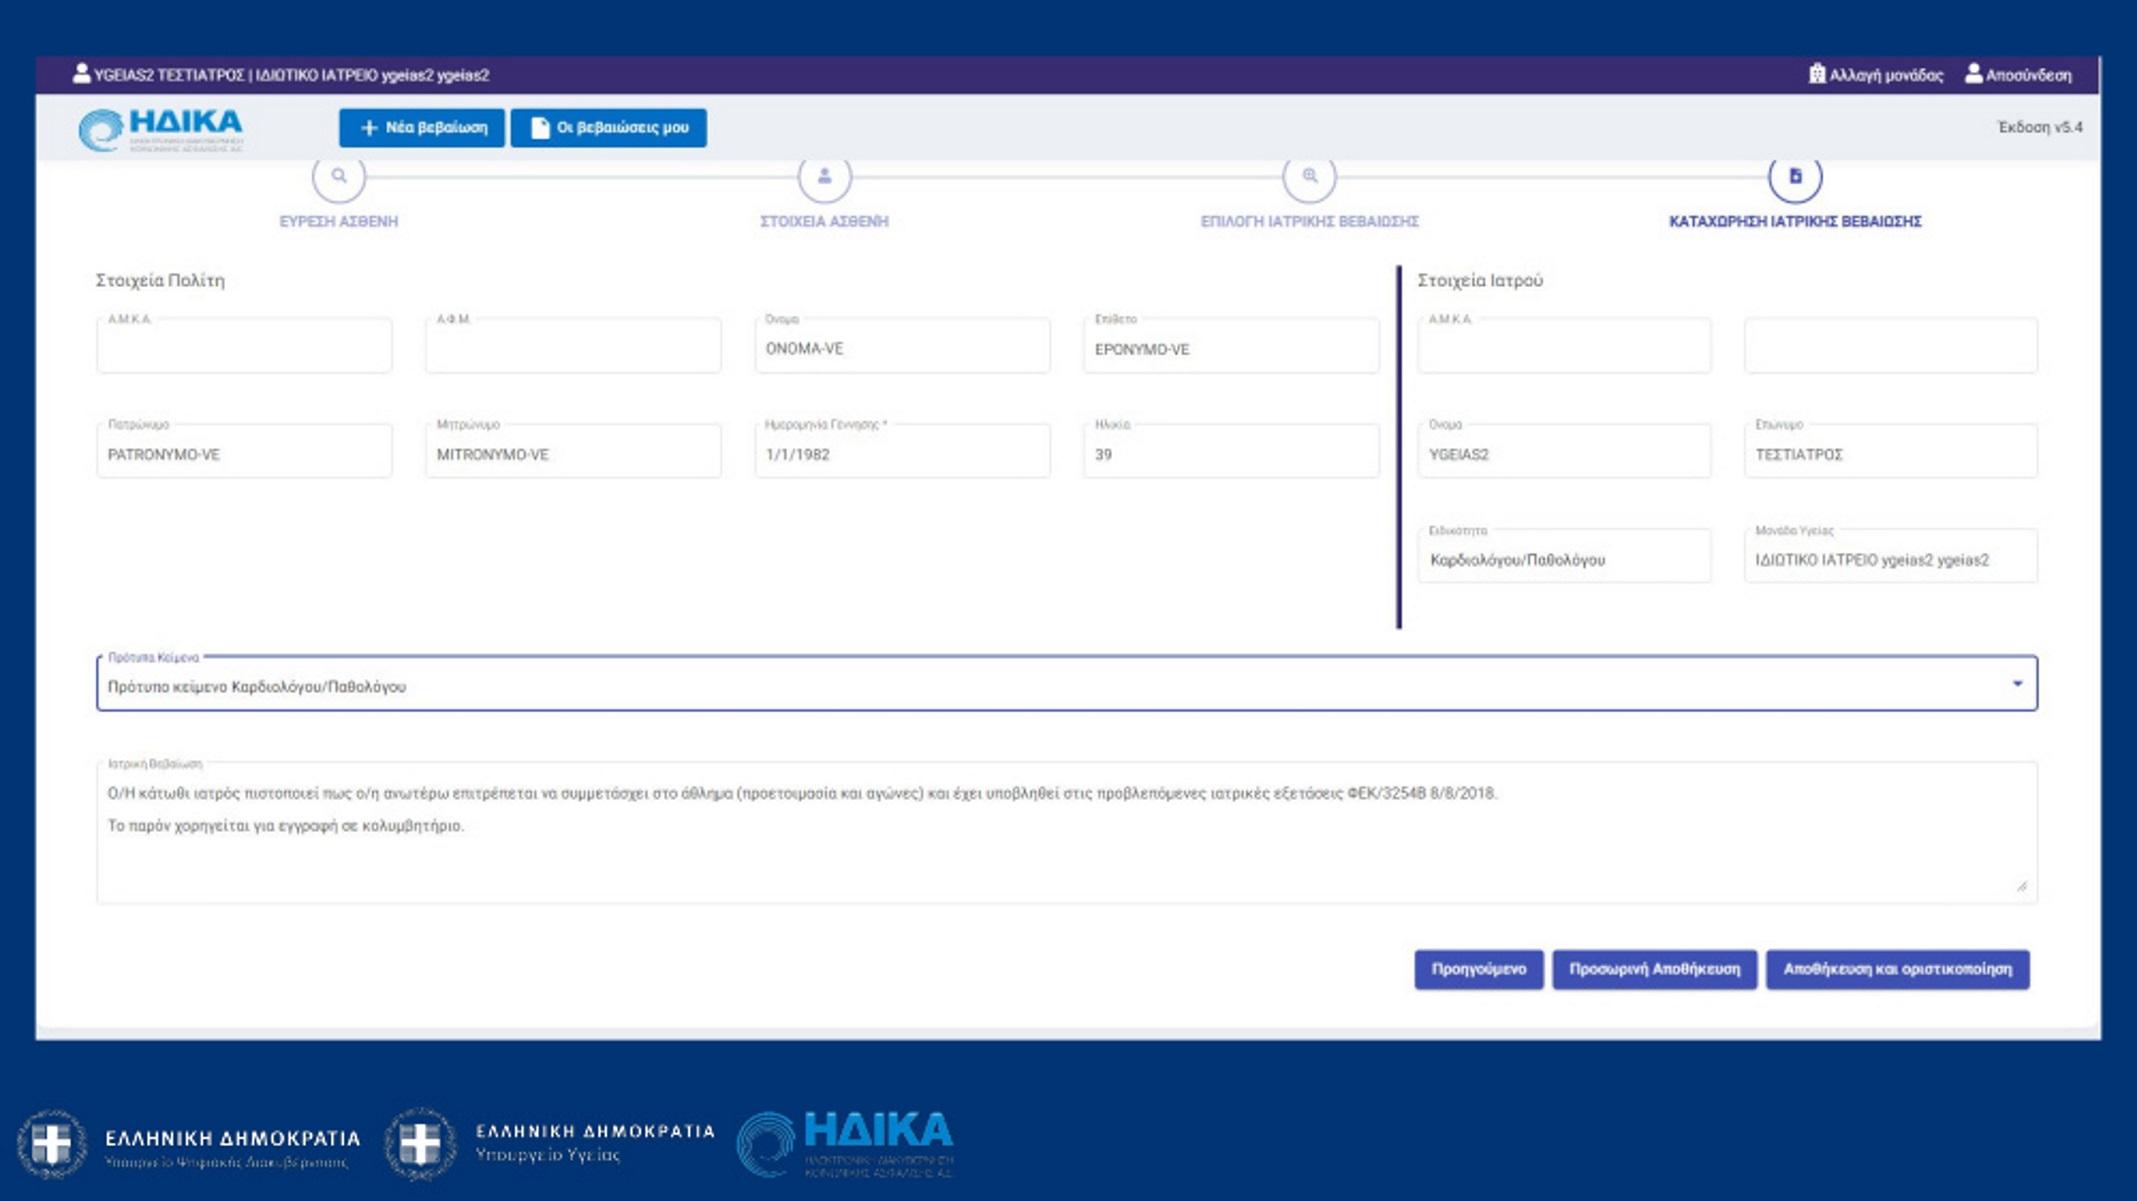 myHealth app: Ιατρικές βεβαιώσεις με ένα κλικ – Πάνω από 300 πολίτες εξυπηρετήθηκαν την πρώτη μέρα